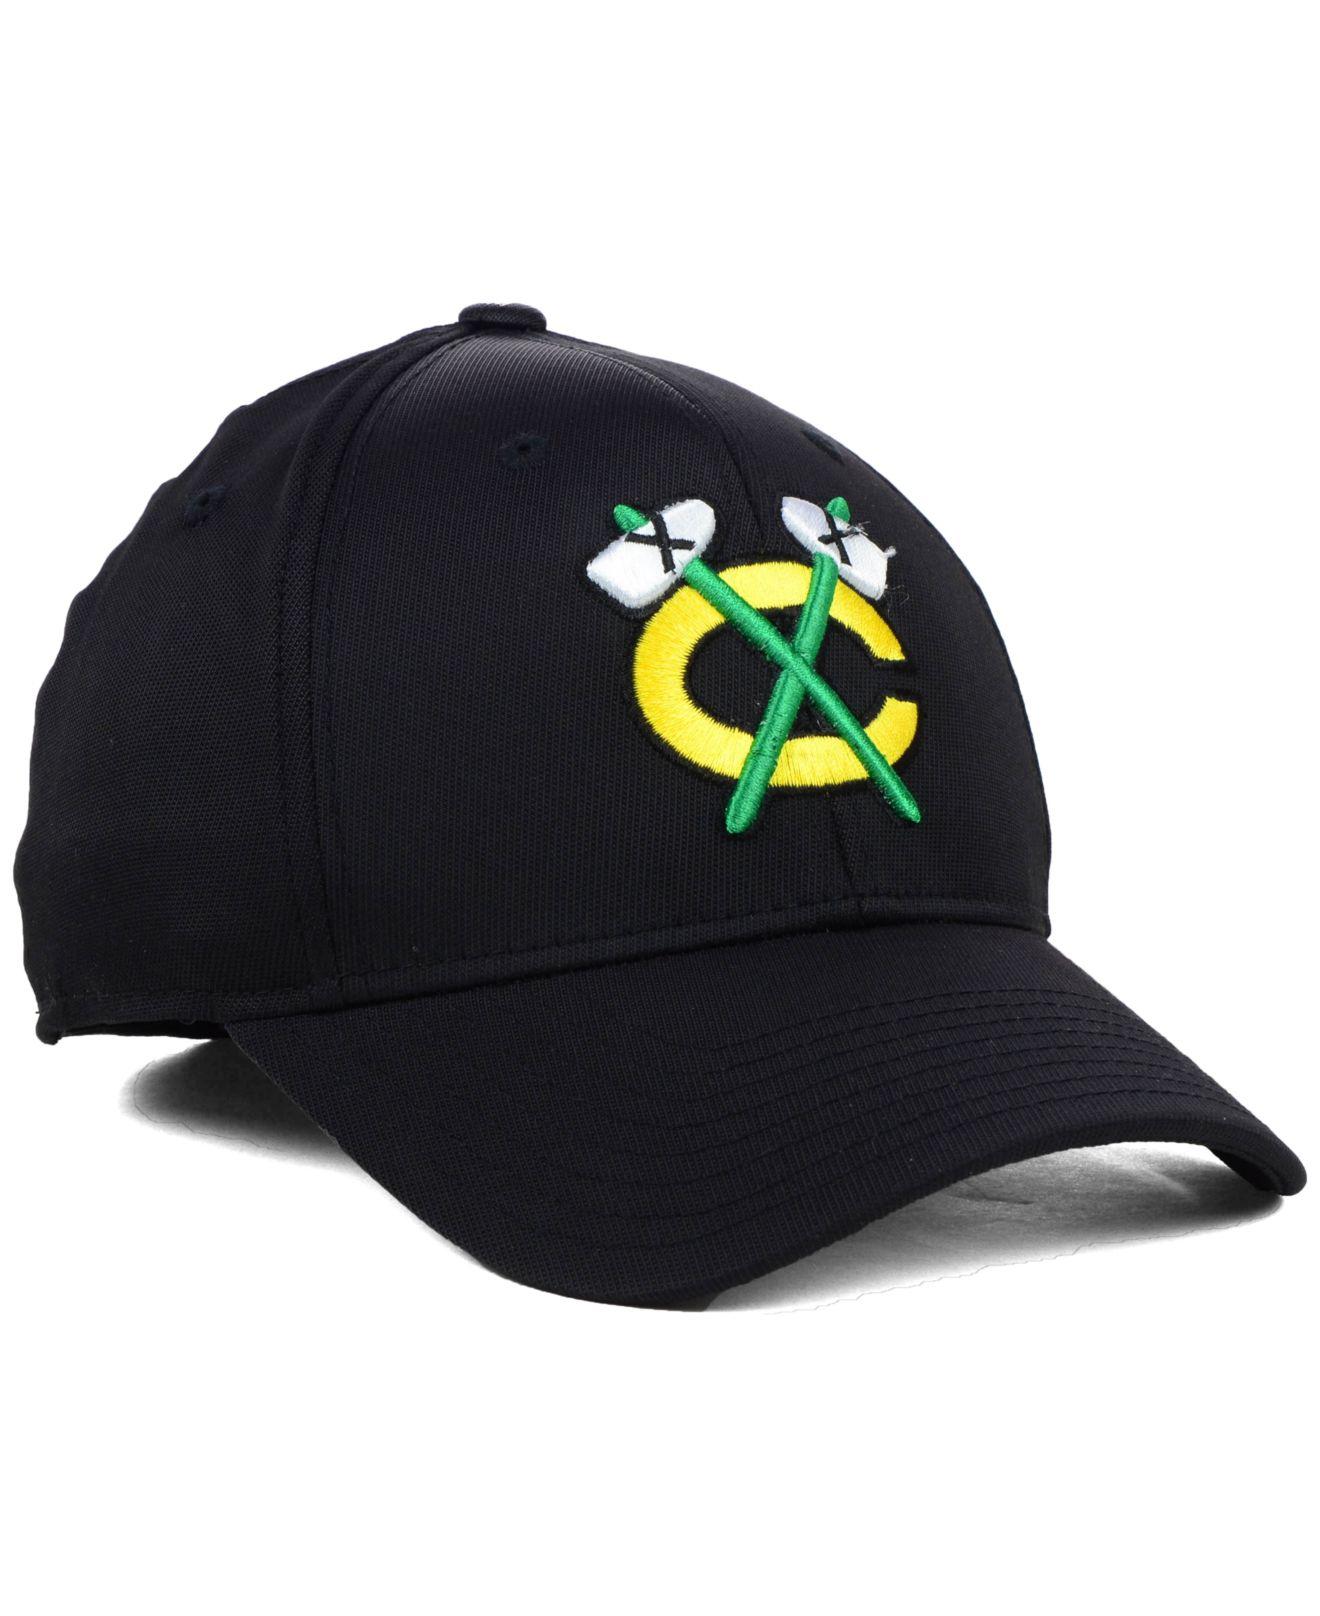 3ae2686a23b Lyst - Reebok Chicago Blackhawks Nhl Hat Trick 2.0 Cap in Black for Men